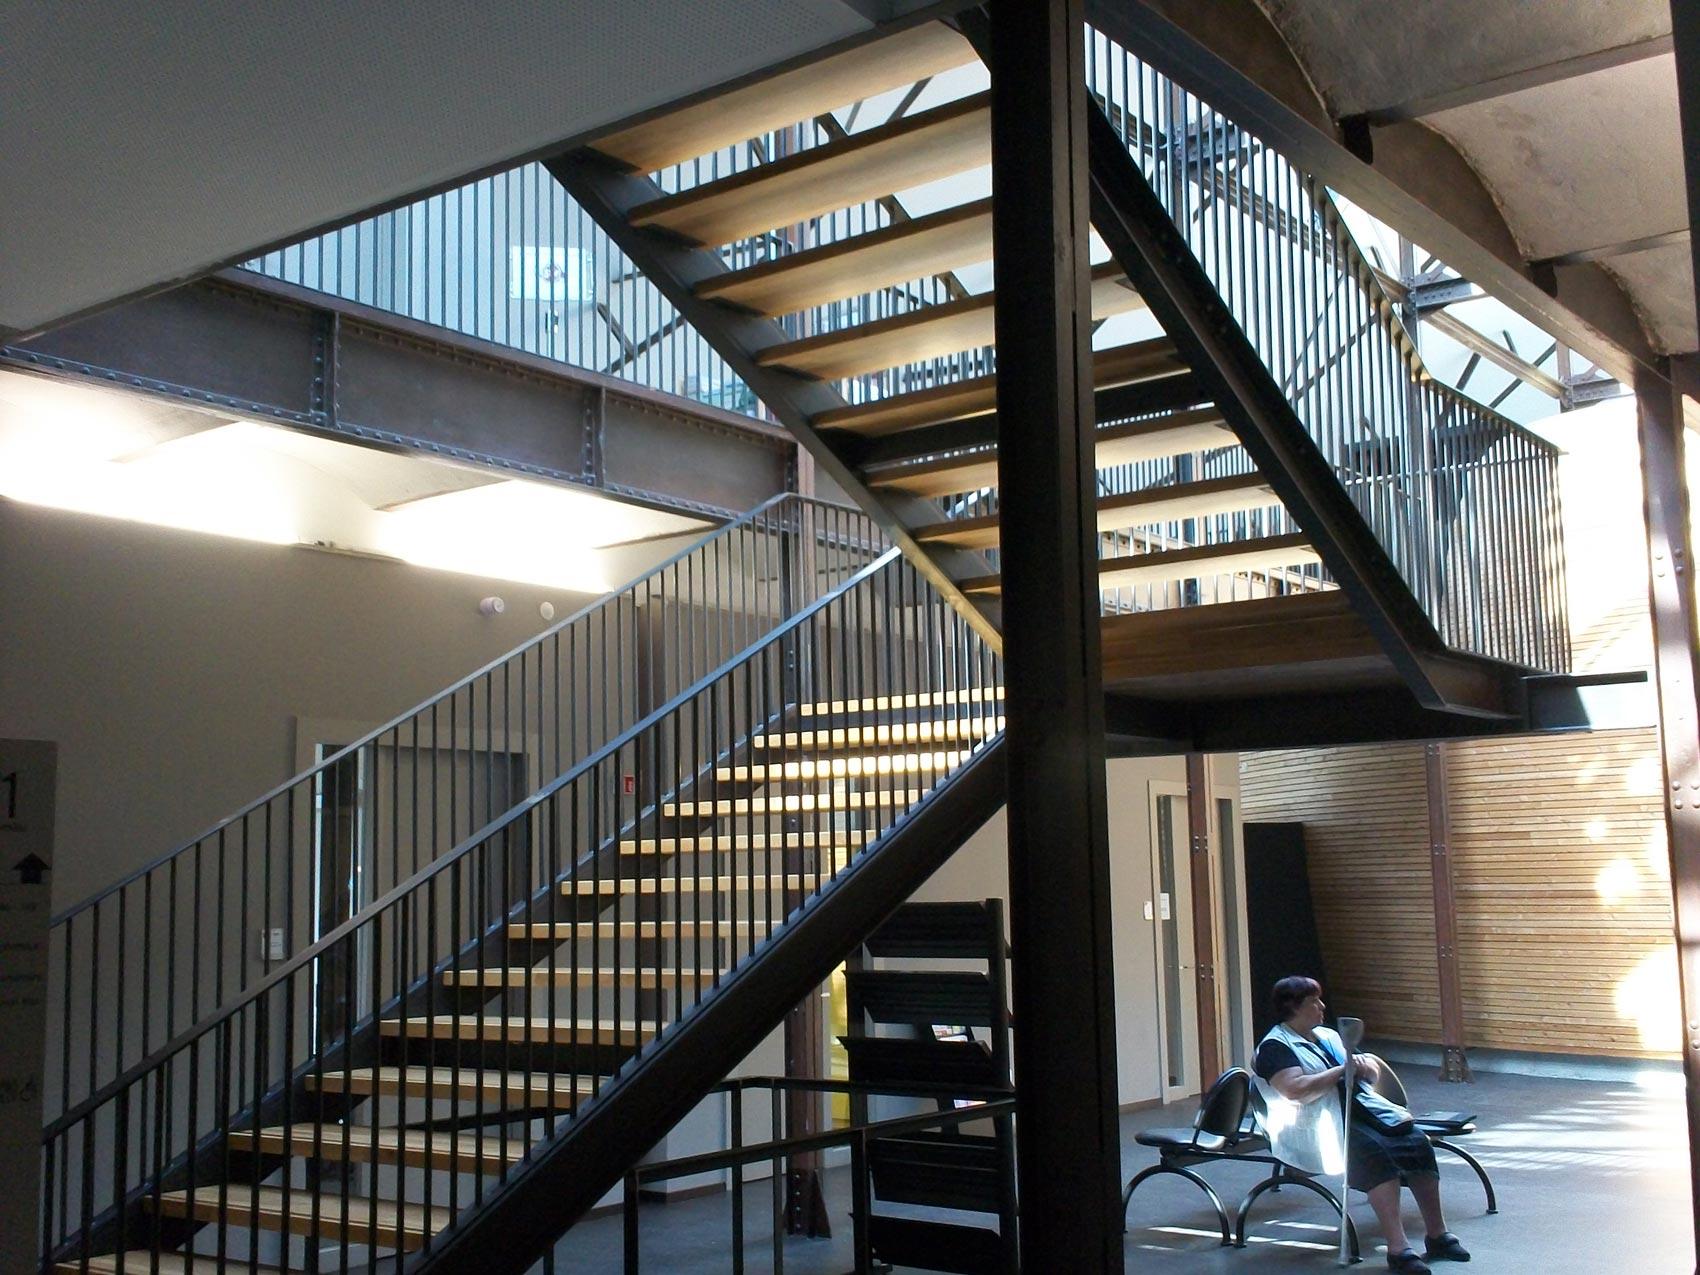 construction métallique - serrurerie métallique alsace 68 - conseil général bas rhin - muller rost